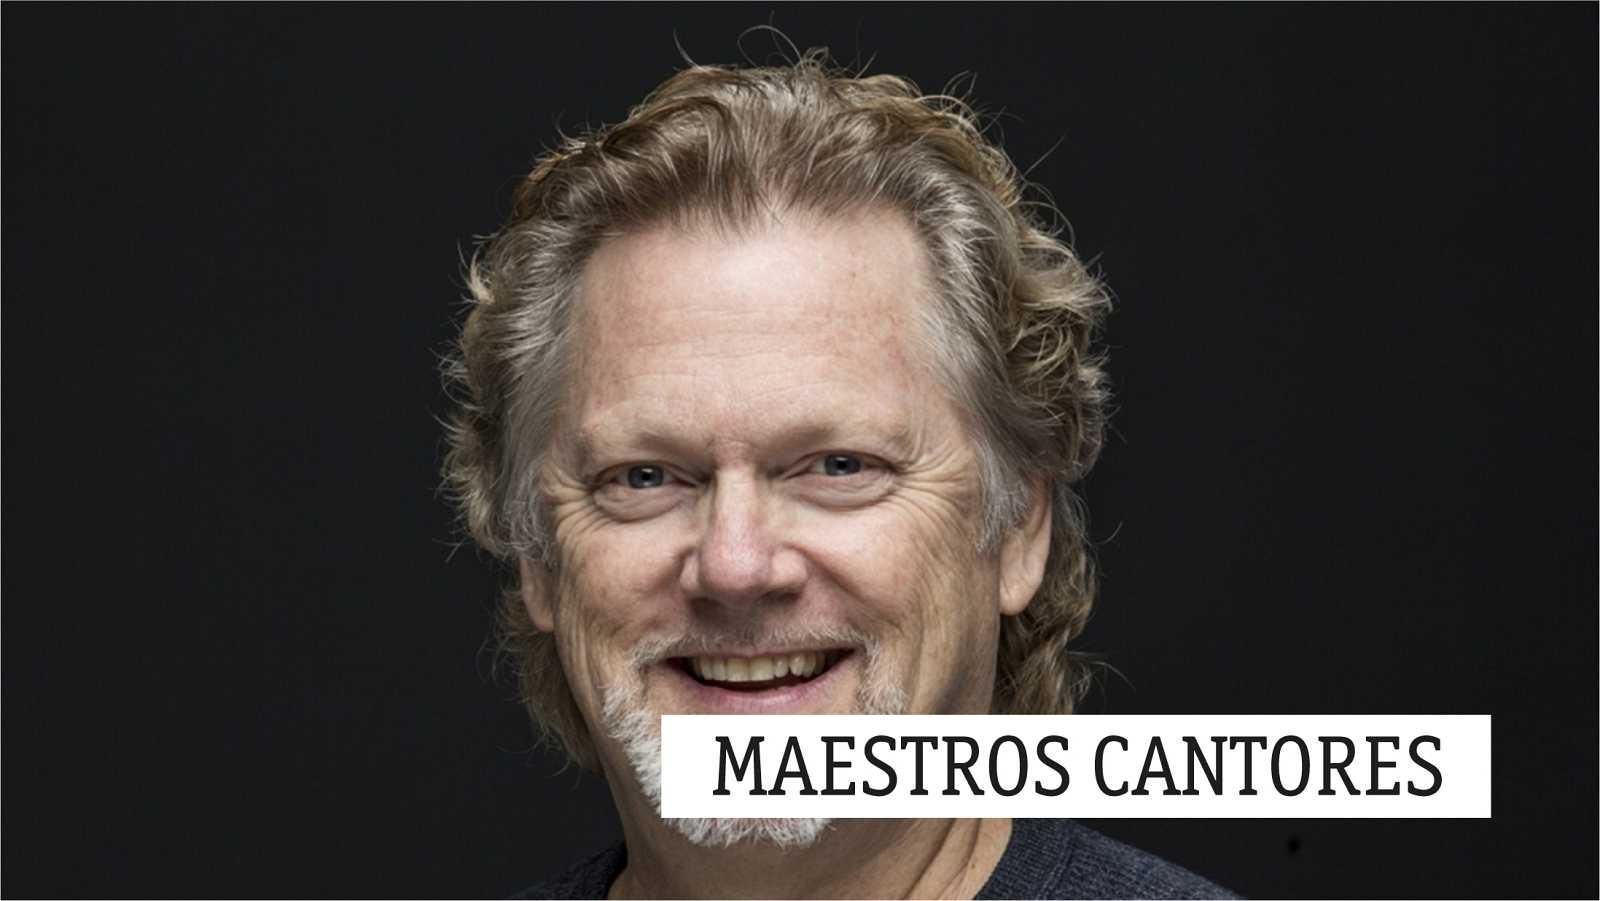 Maestros cantores - 23/11/19 - escuchar ahora